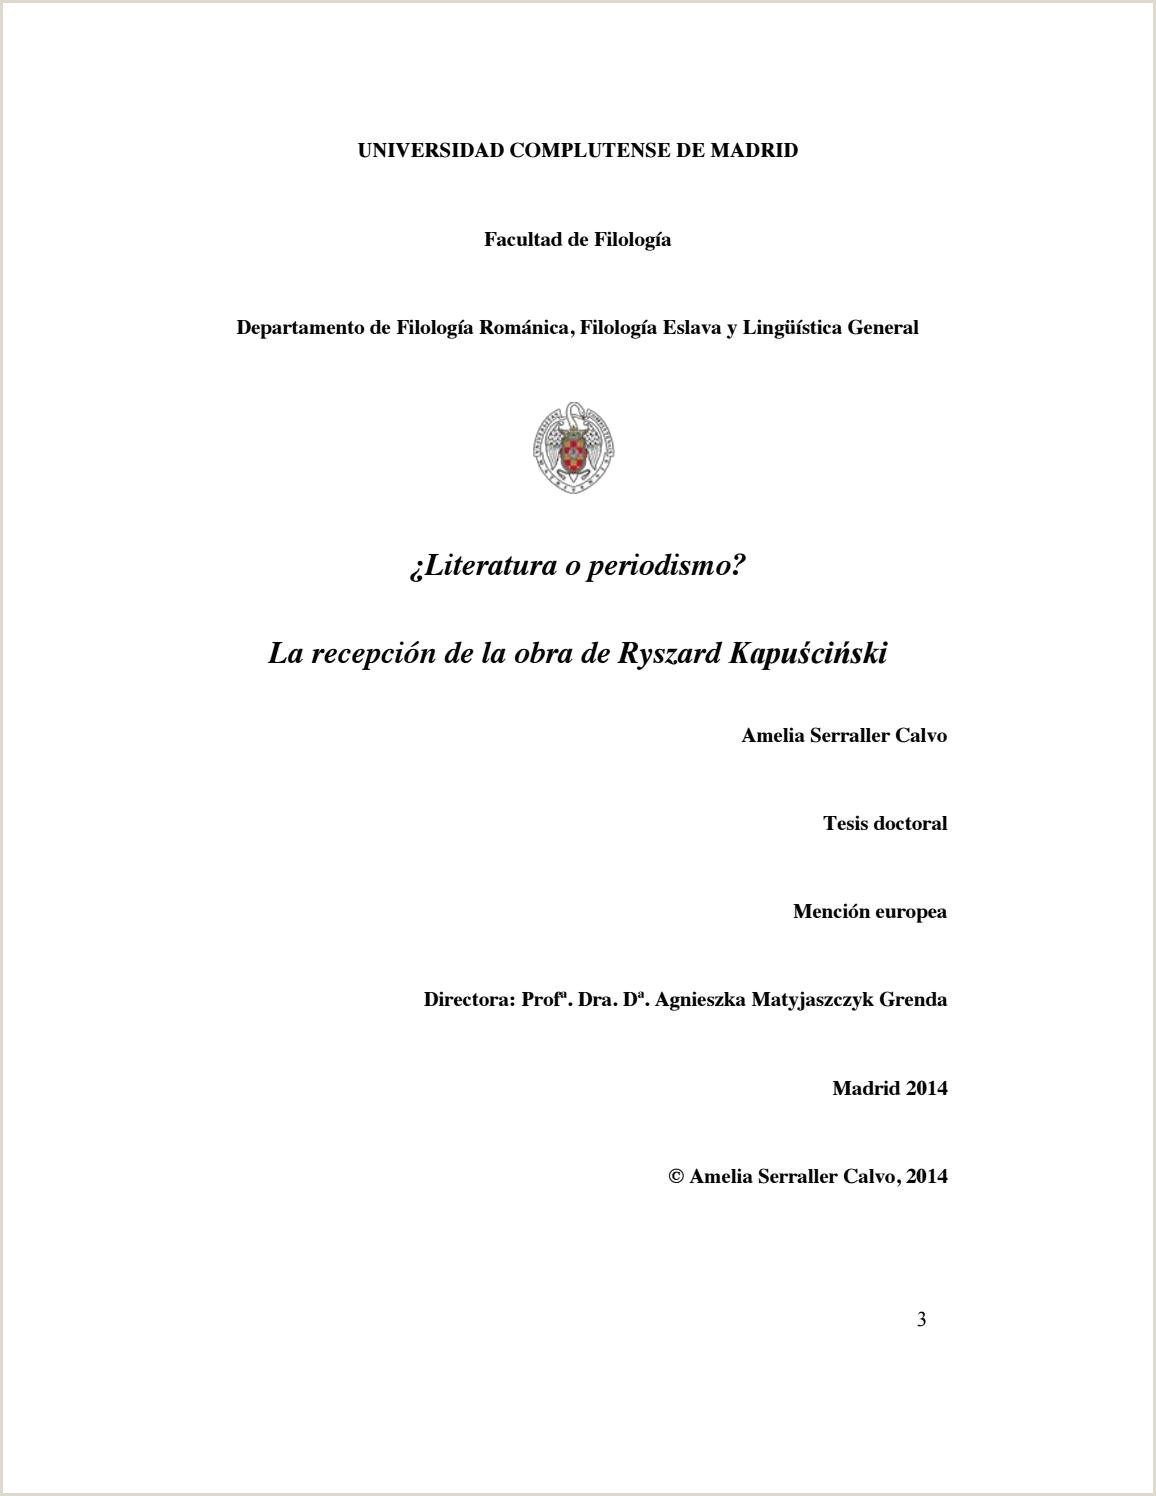 Formato Hoja De Vida Bonita Literatura O Periodismo La Recepci³n De La Obra De Ryzard